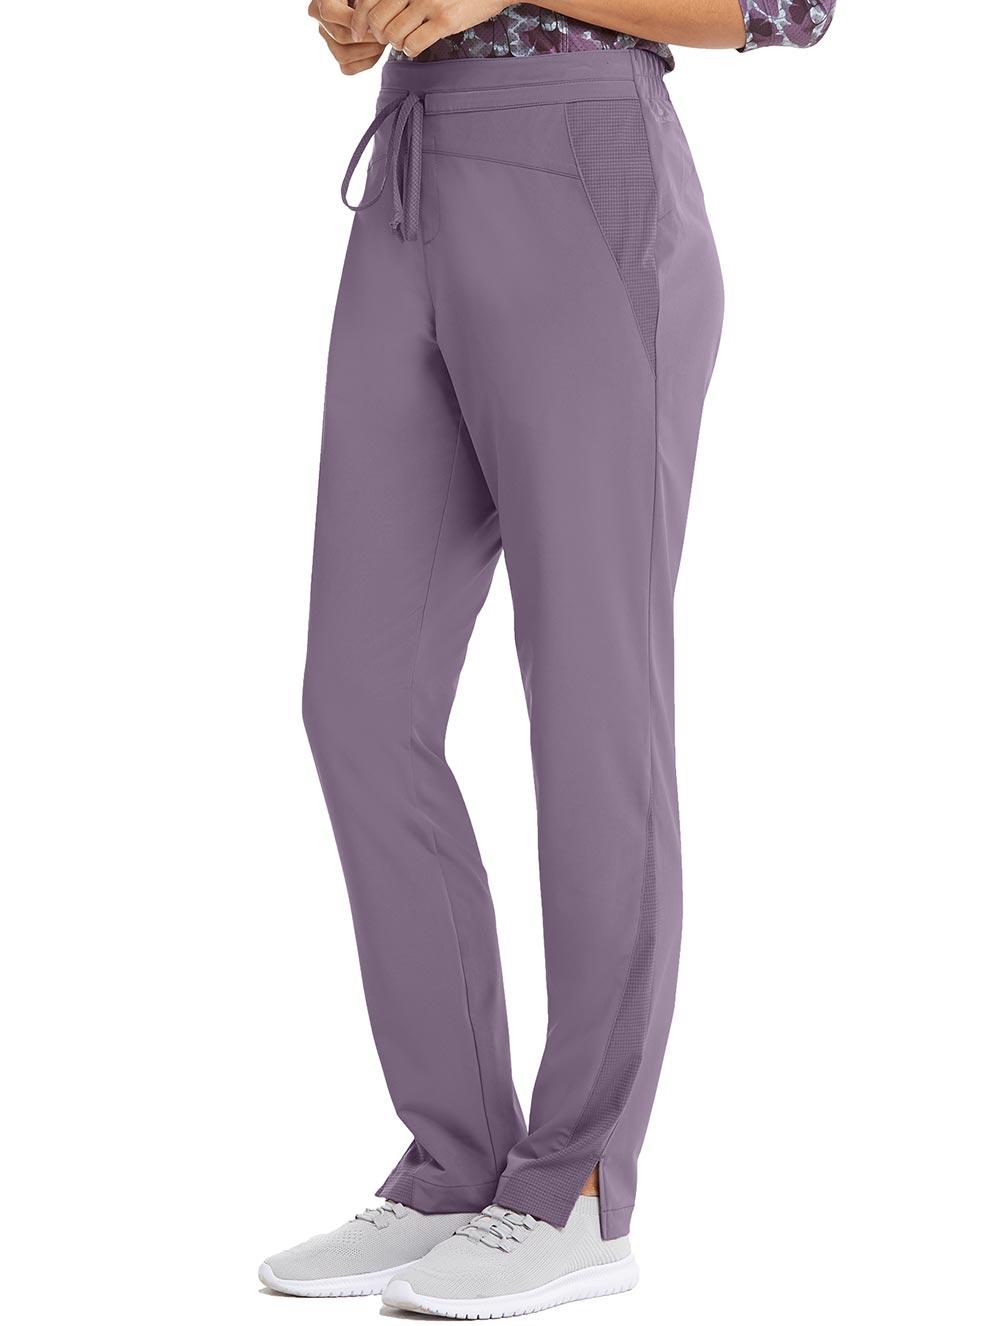 4-Pocket Flat Front Pant